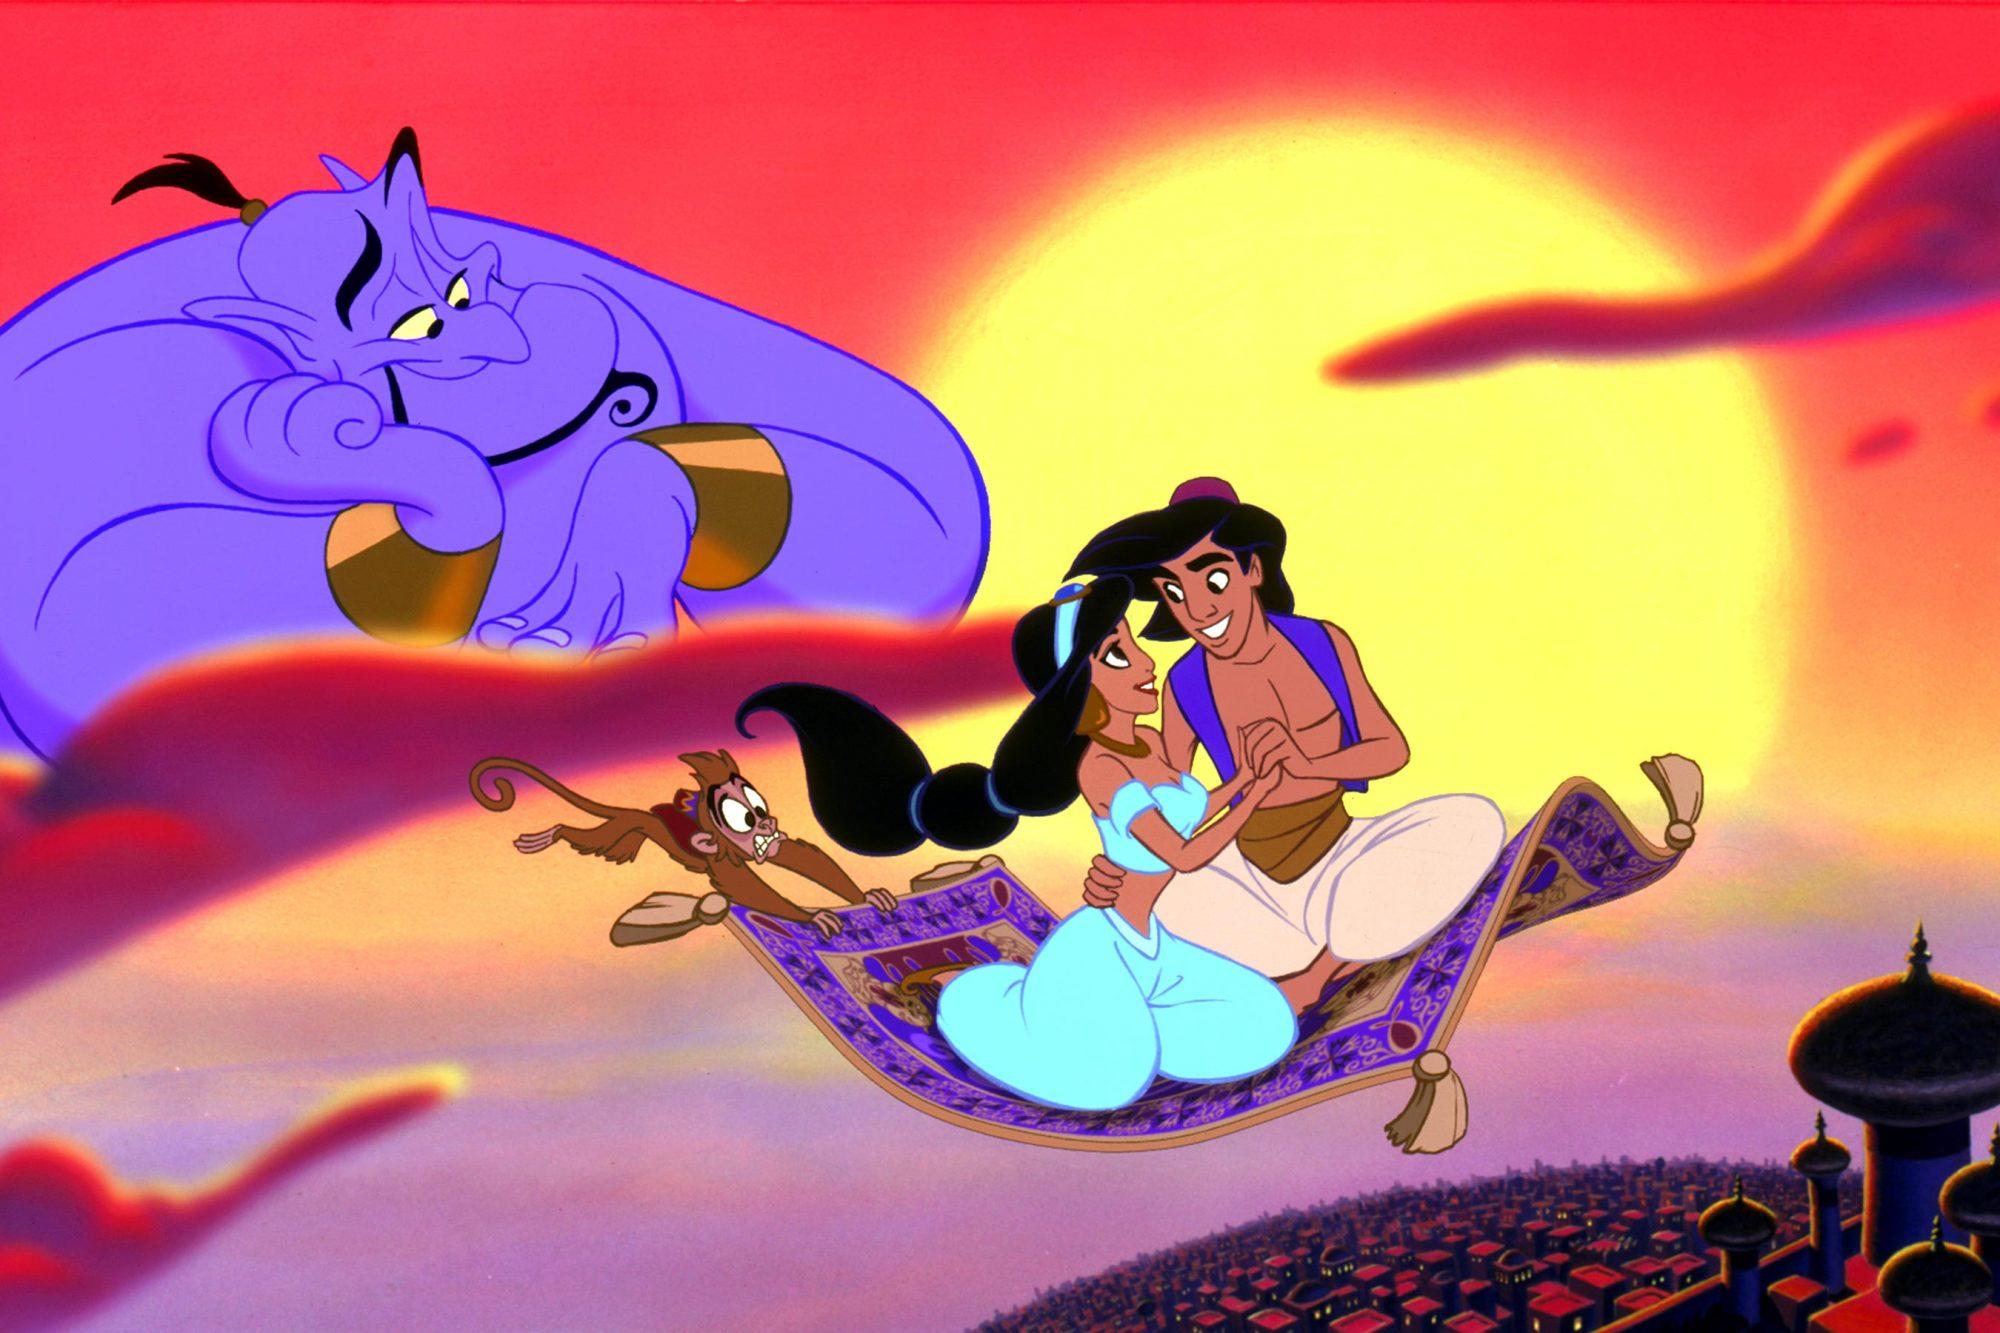 ALADDIN, Genie, Jasmine, Aladdin, 1992. (c) Buena Vista Pictures/ Courtesy: Everett Collection.